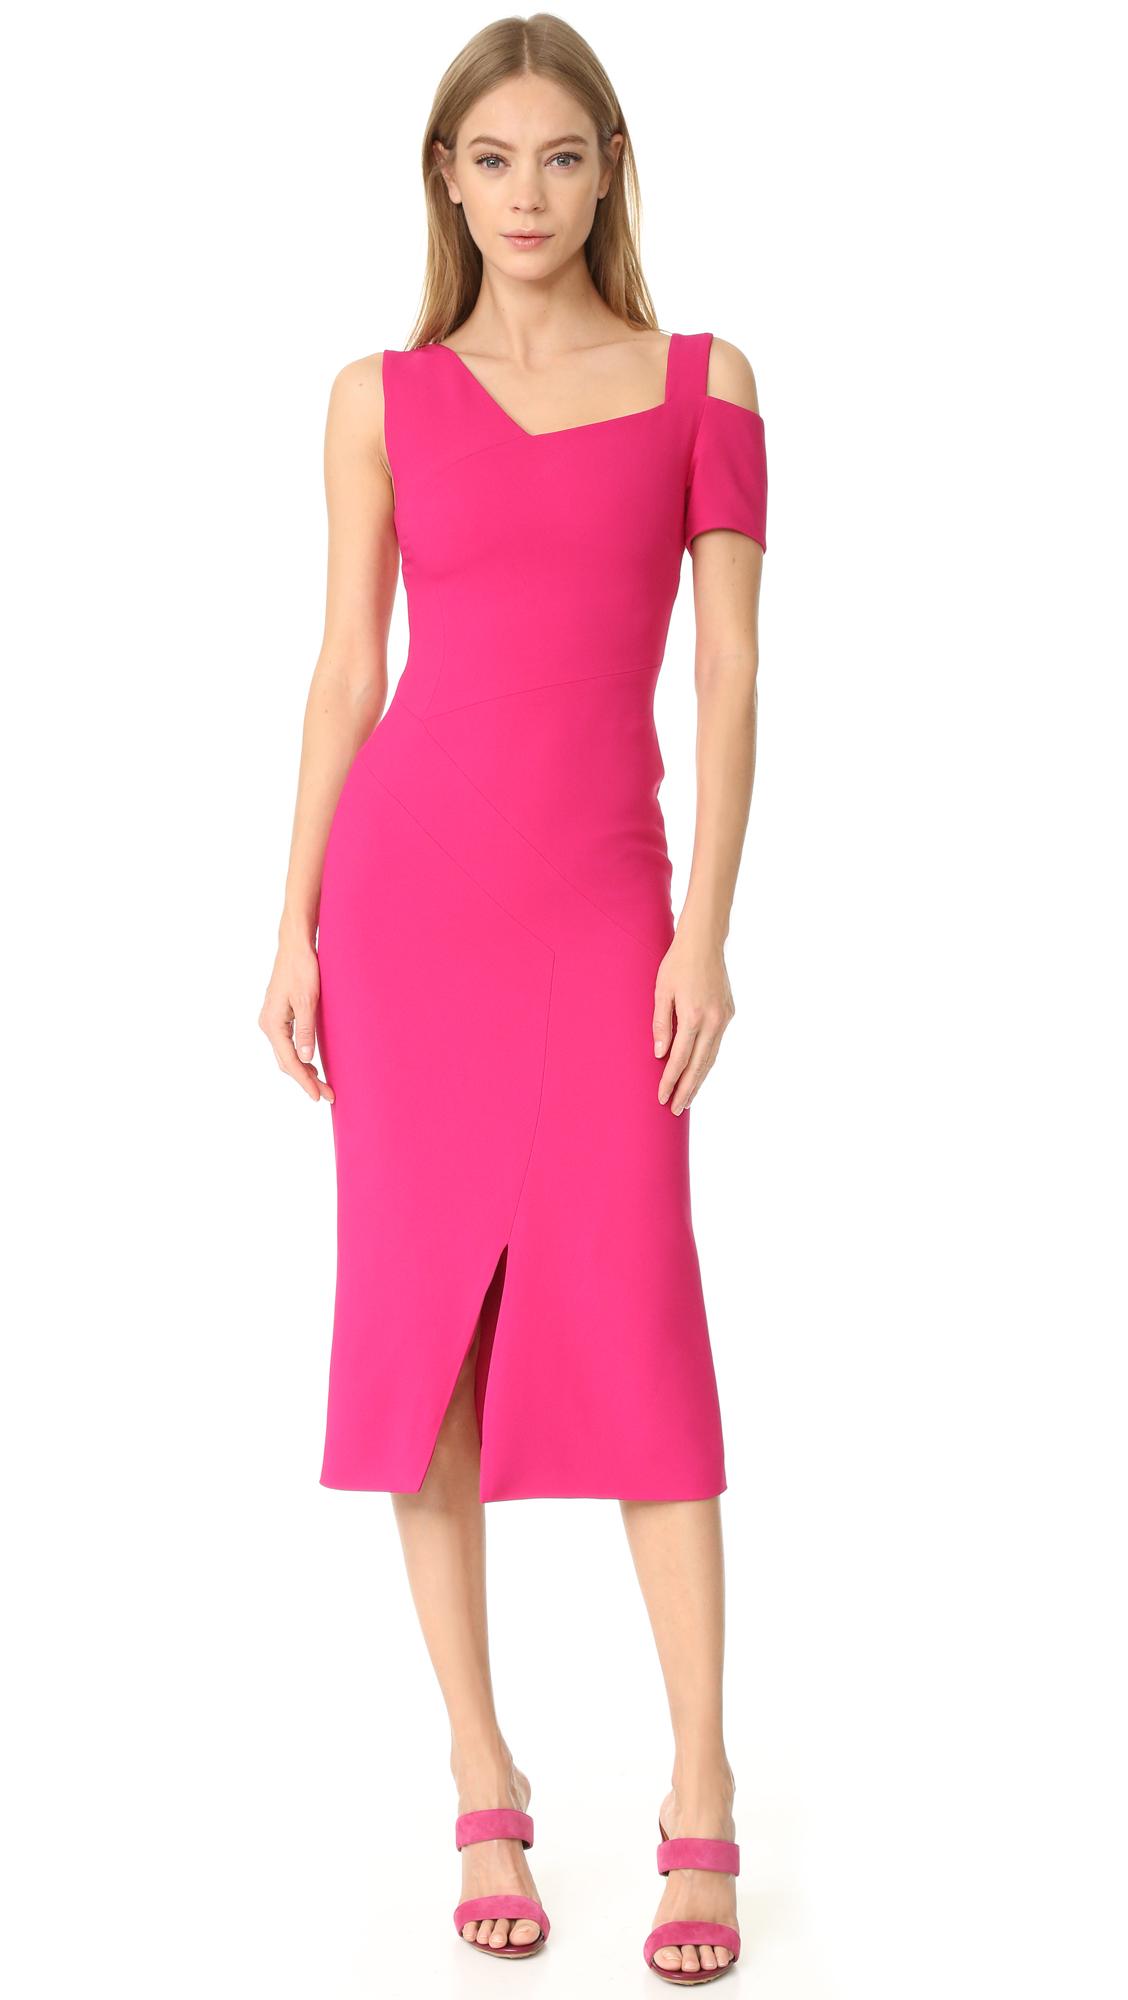 Antonio Berardi Knee Length Dress - Cardinale at Shopbop